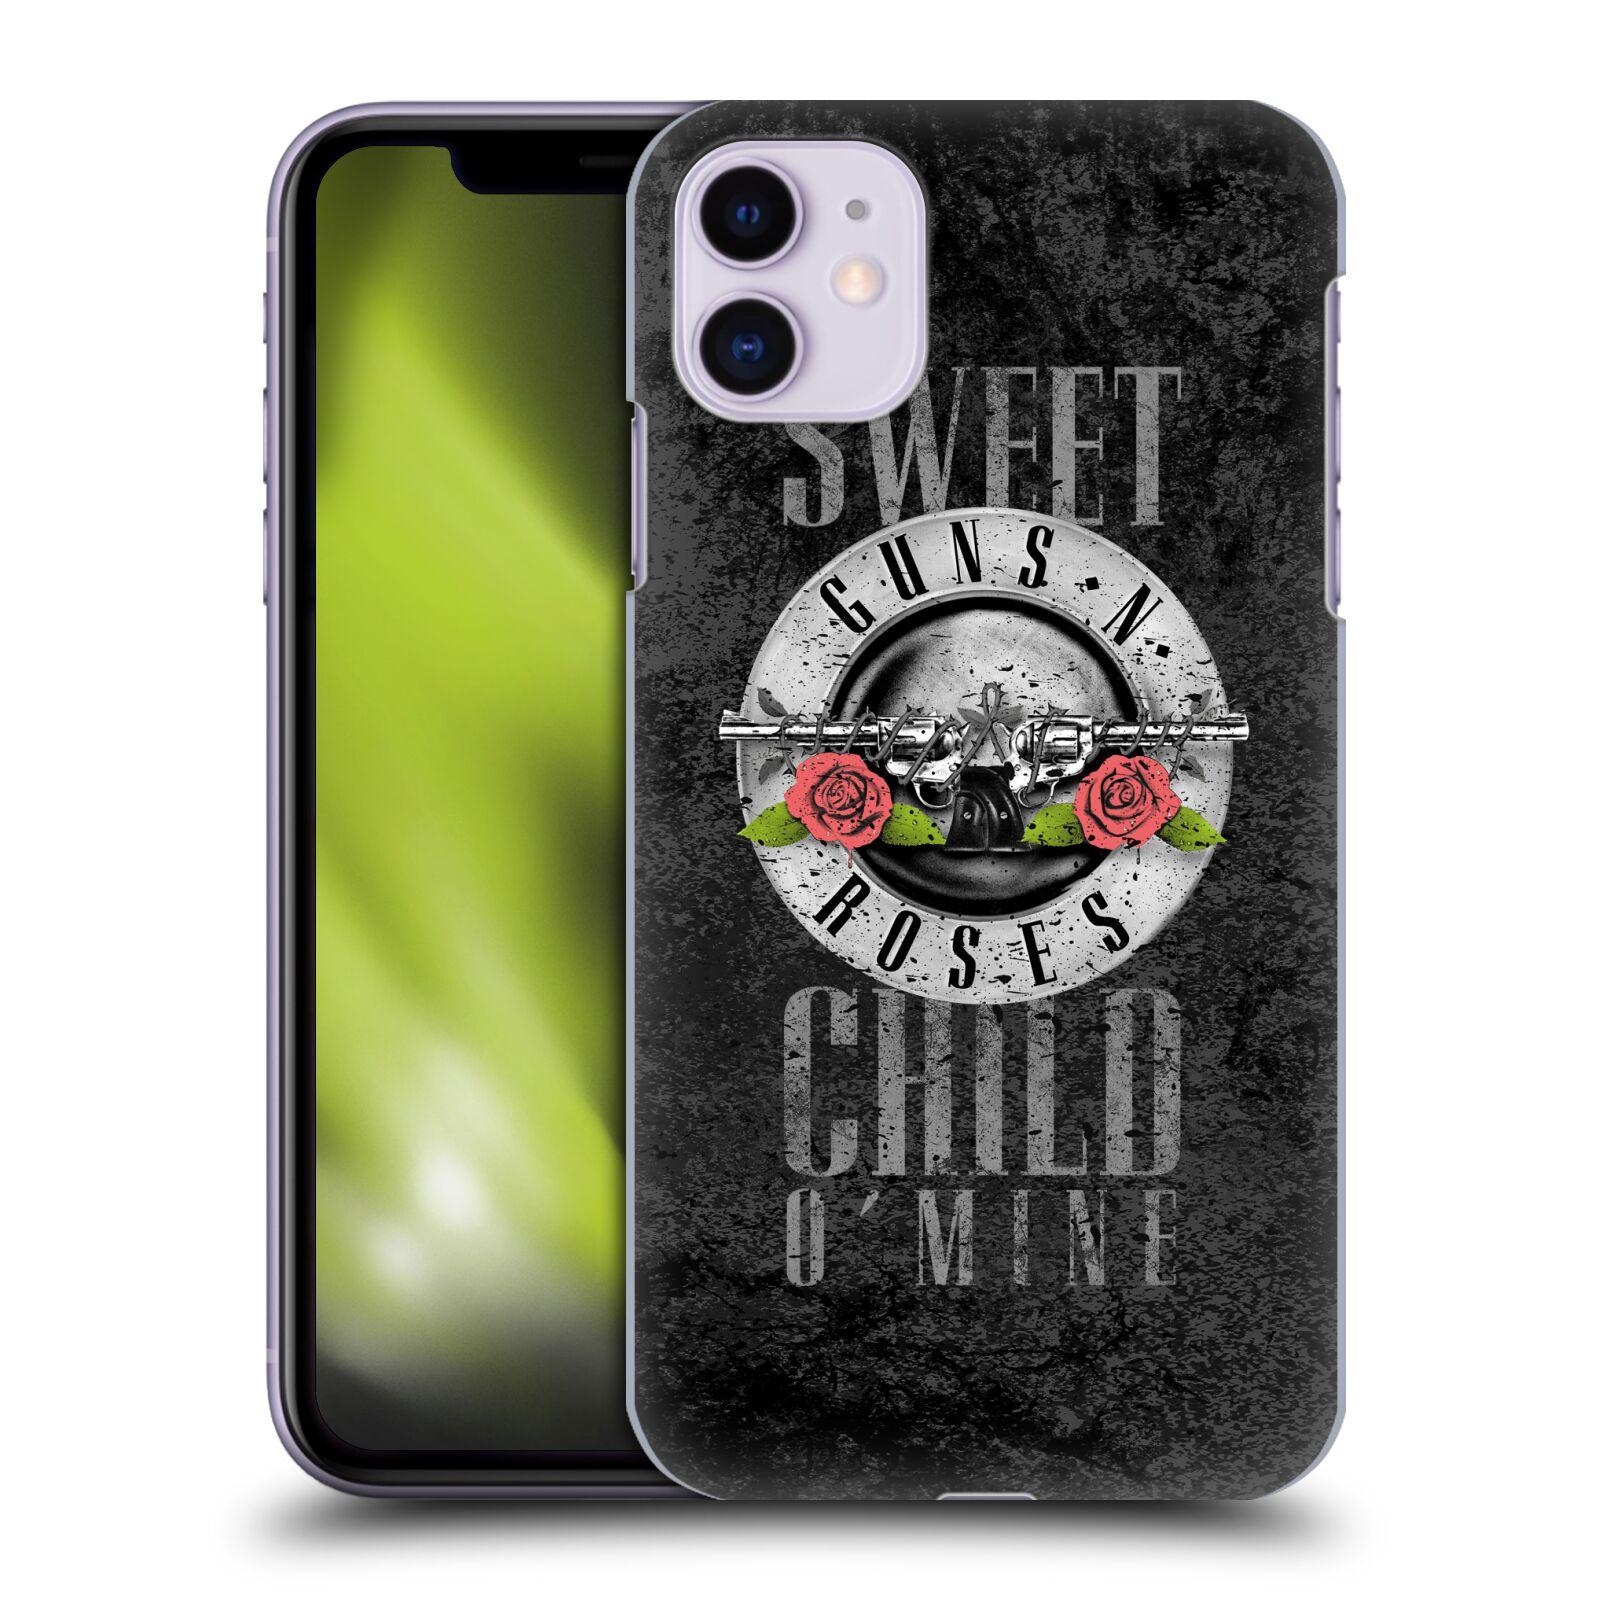 Plastové pouzdro na mobil Apple iPhone 11 - Head Case - Guns N' Roses - Sweet Child